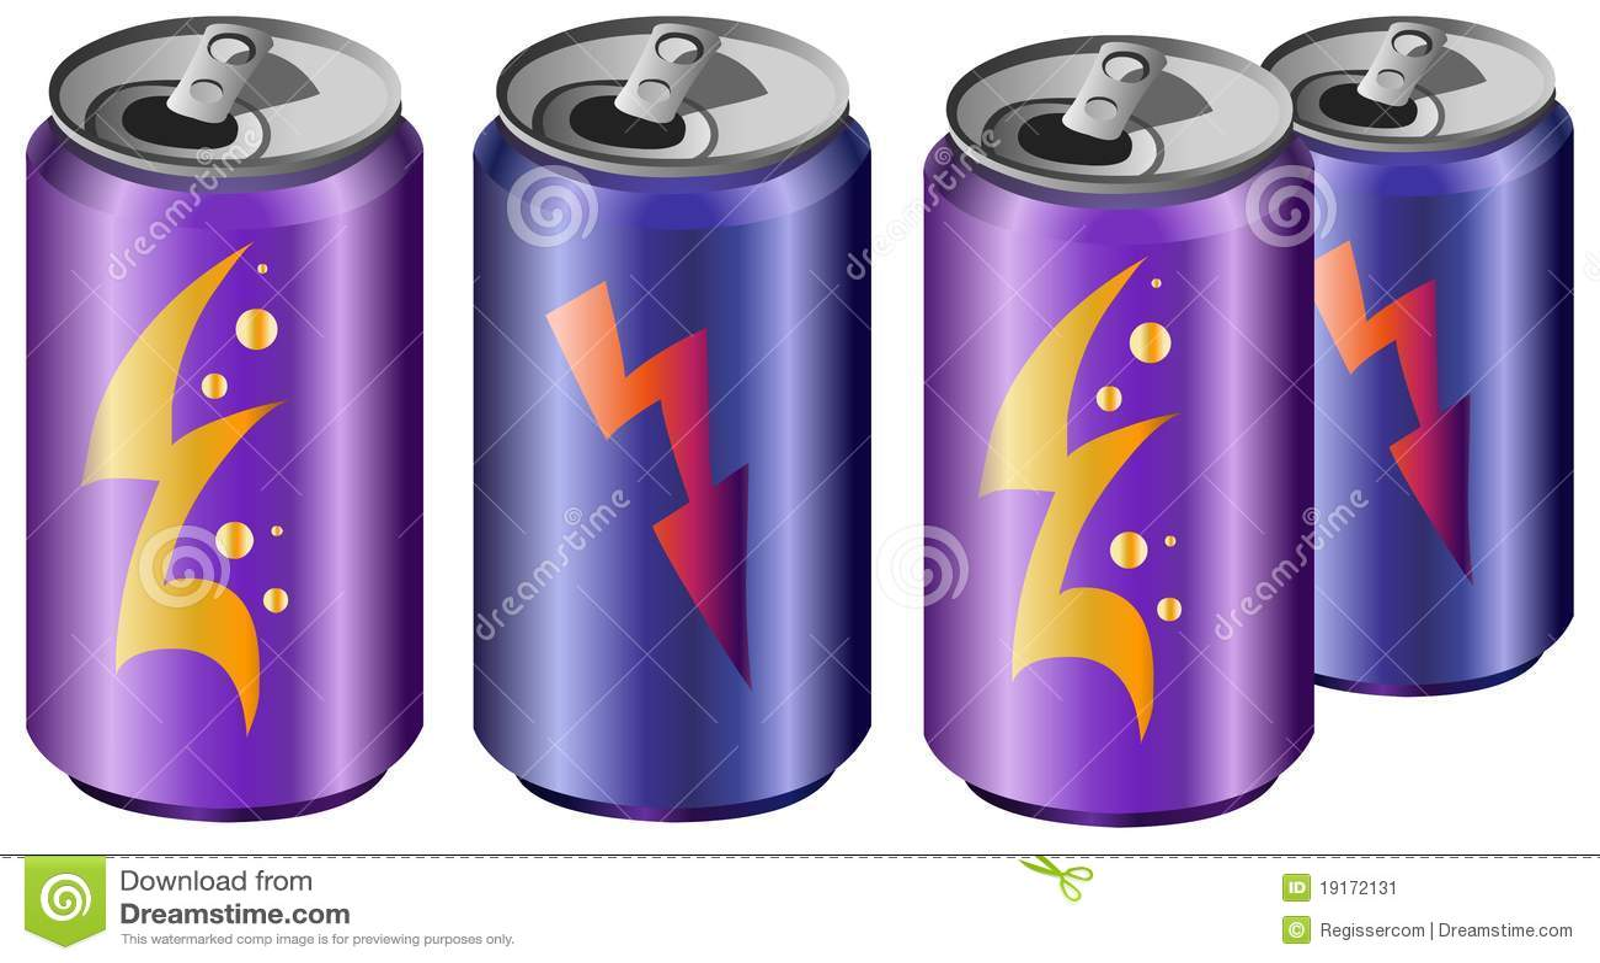 energy drinks stock illustration